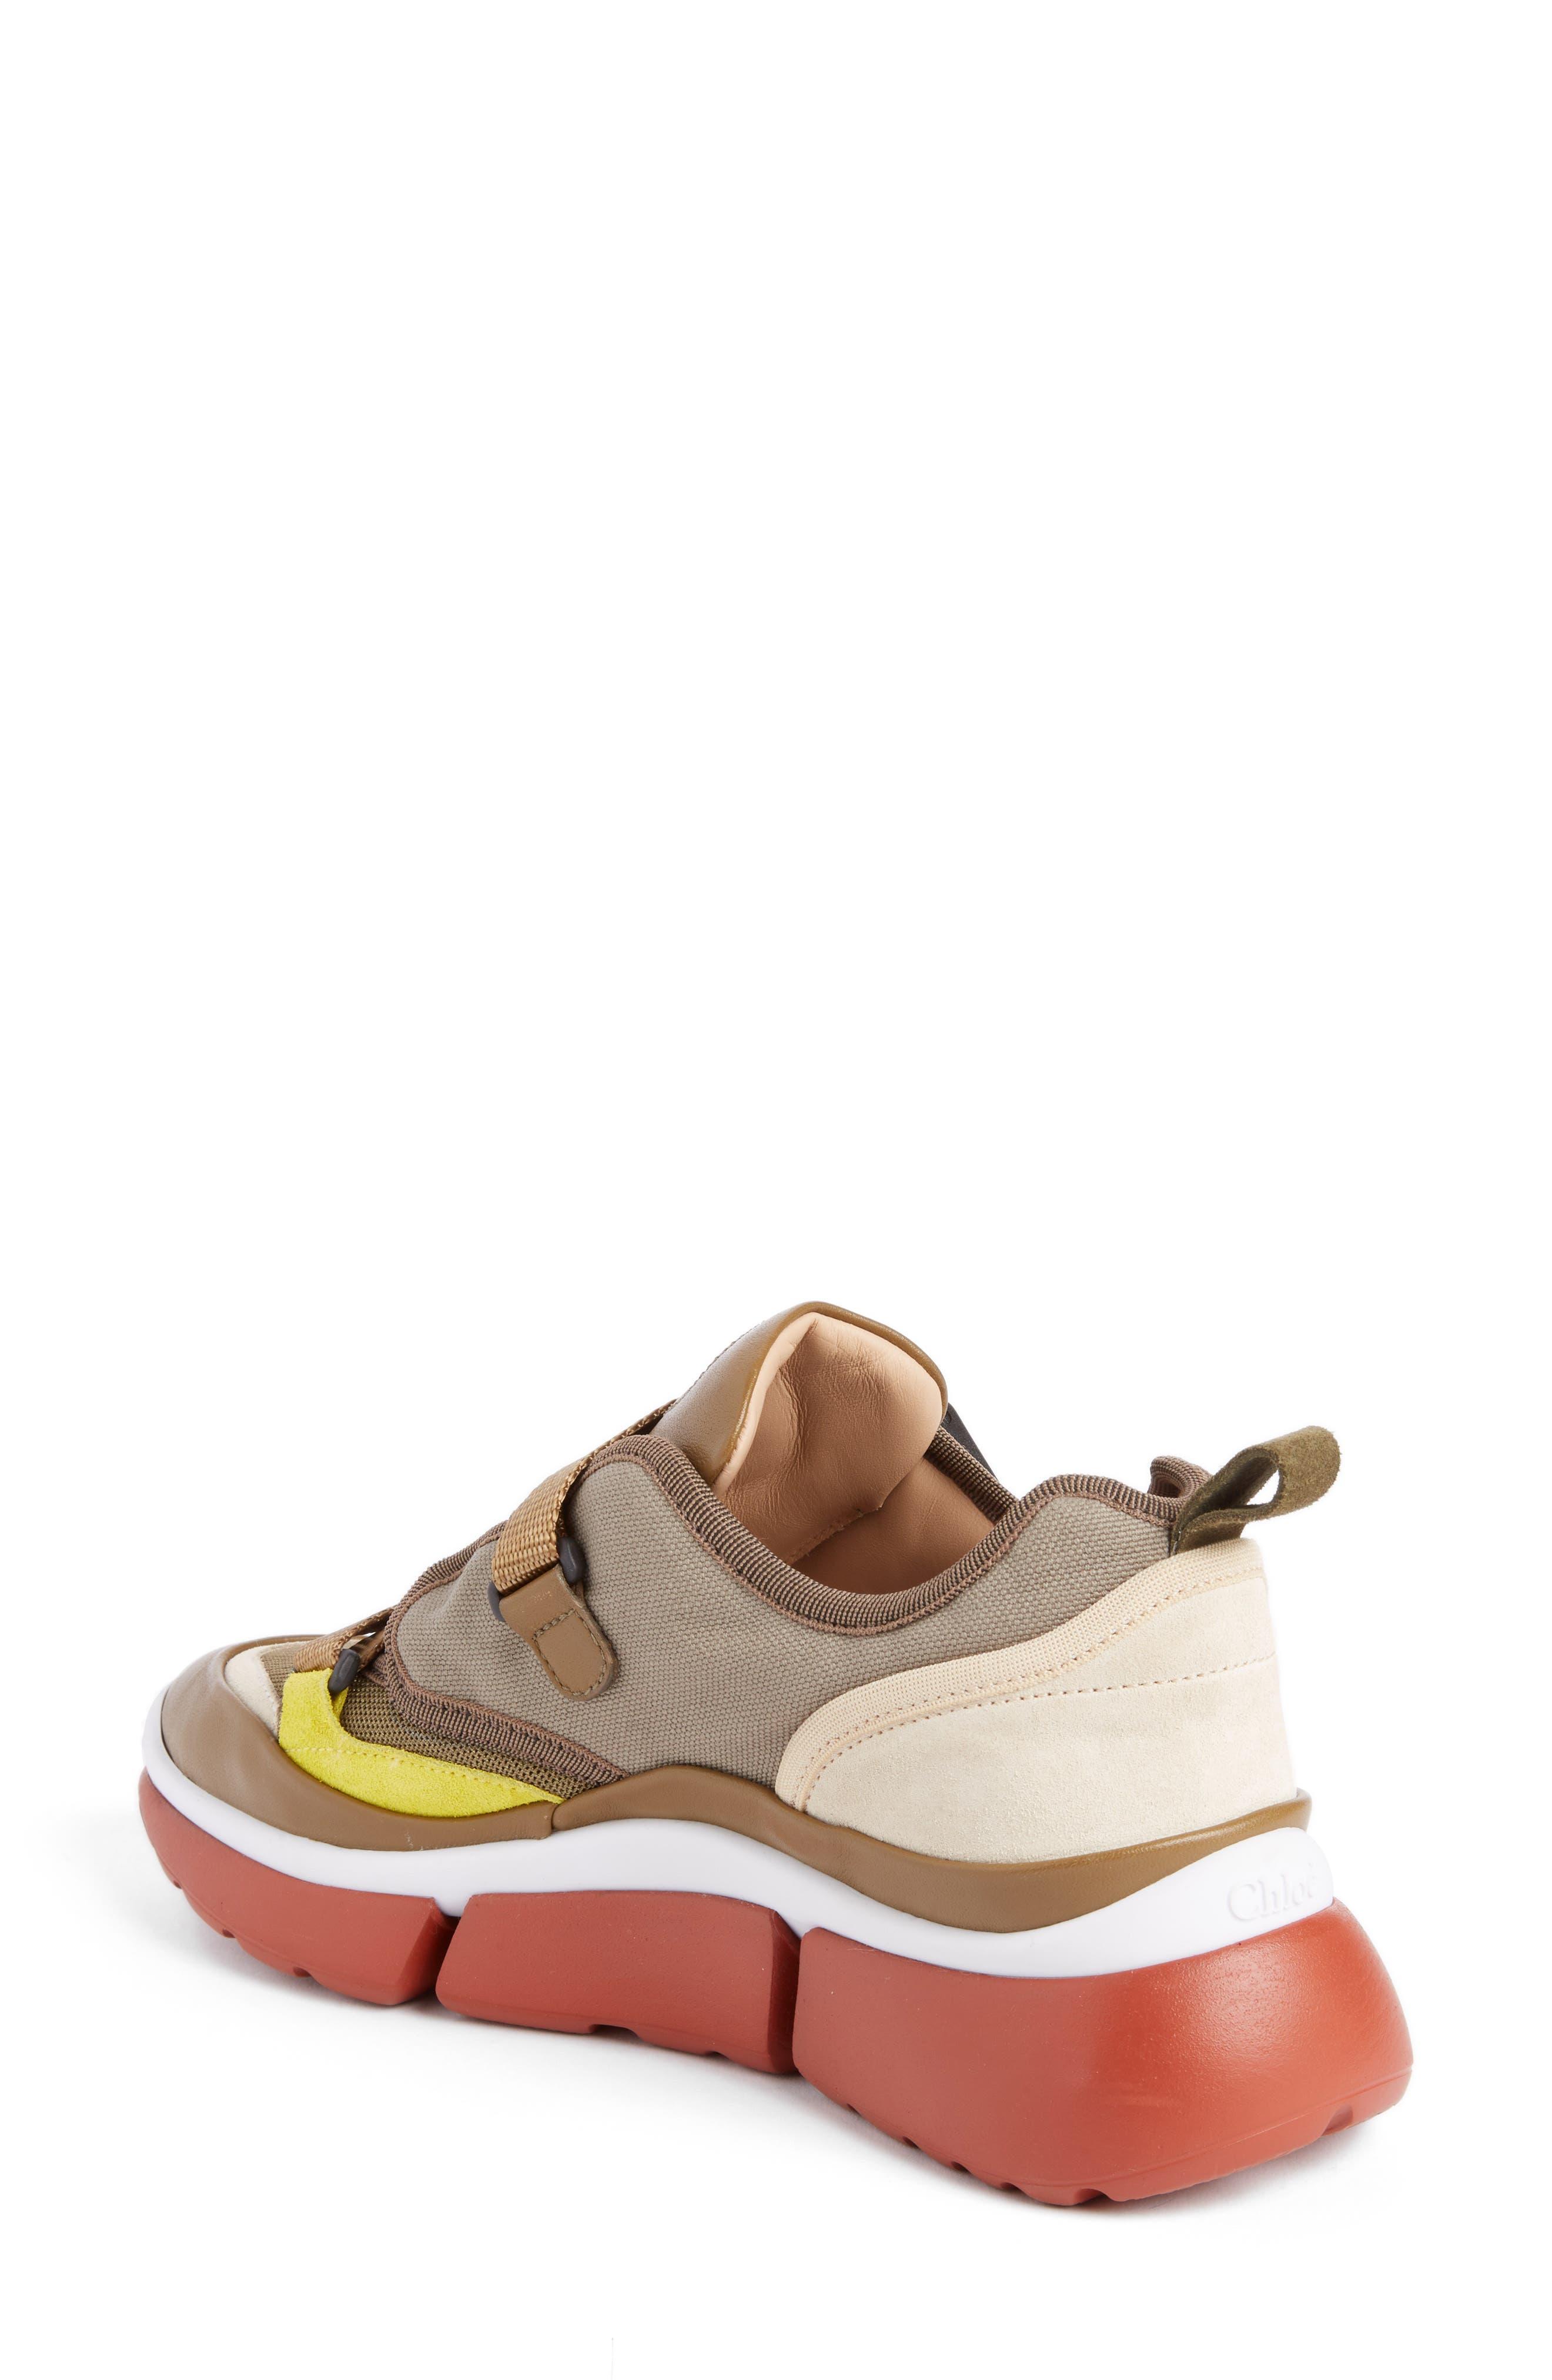 Sonnie Low Top Sneaker,                             Alternate thumbnail 2, color,                             Sooty Khaki